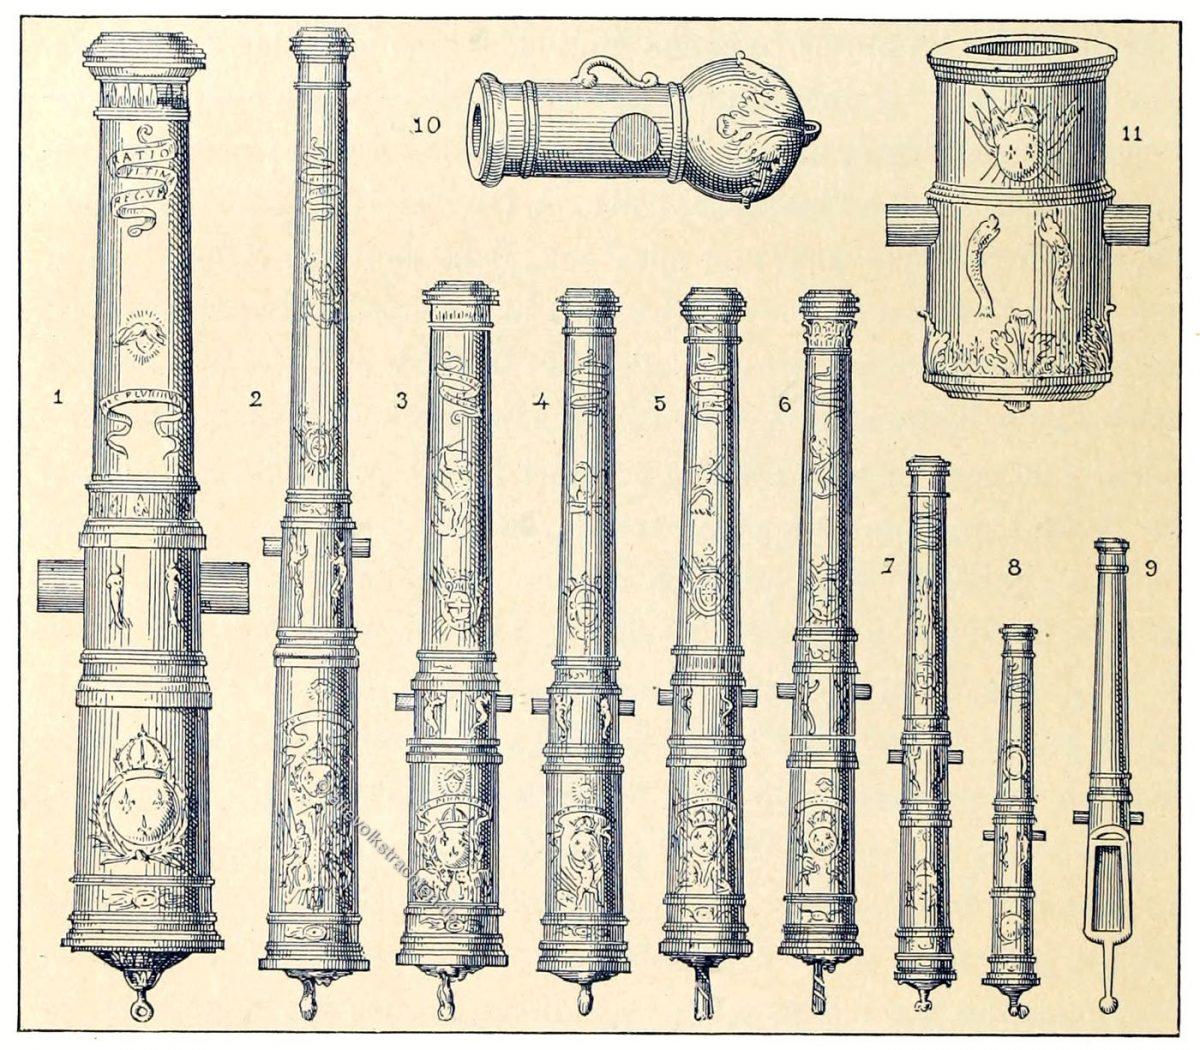 Kanonenarten, Armee, 17. Jahrhundert, Militär, Frankreich, Barock,